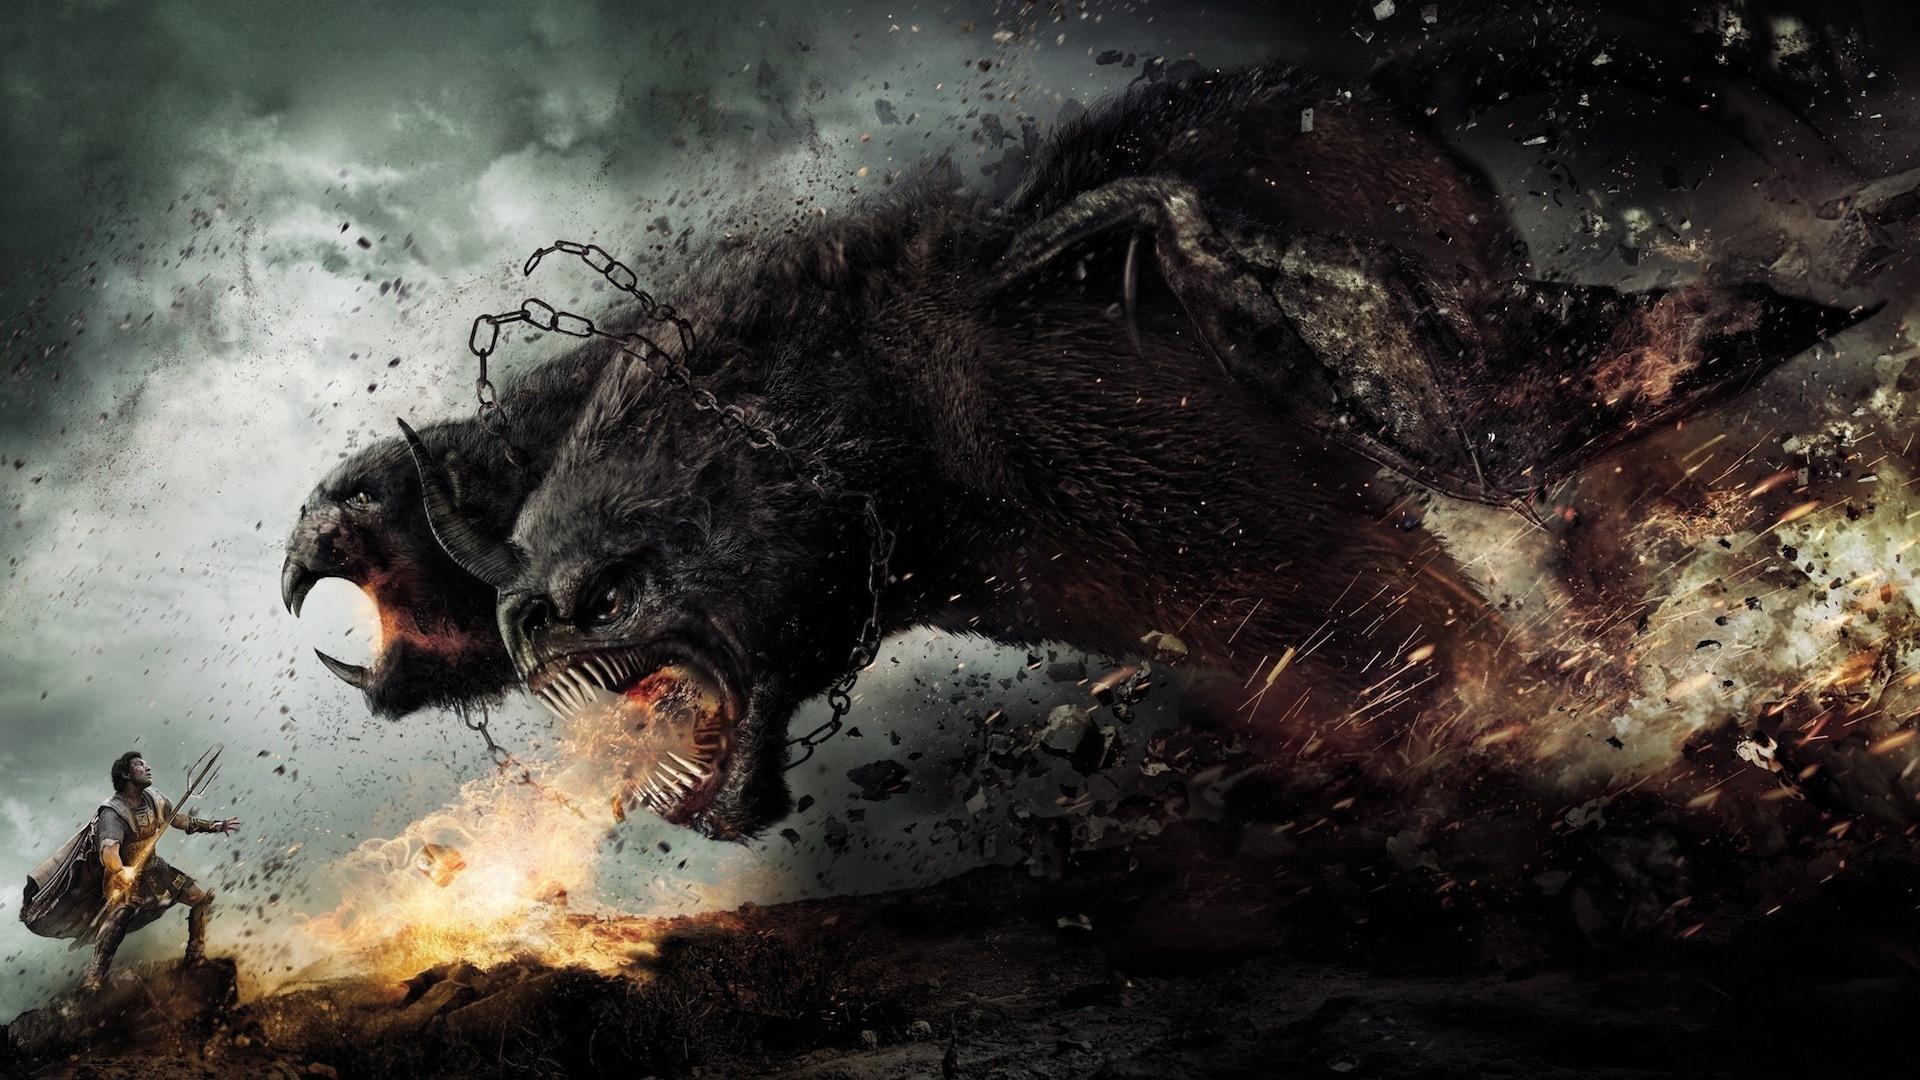 Wrath of the Titans - netflix